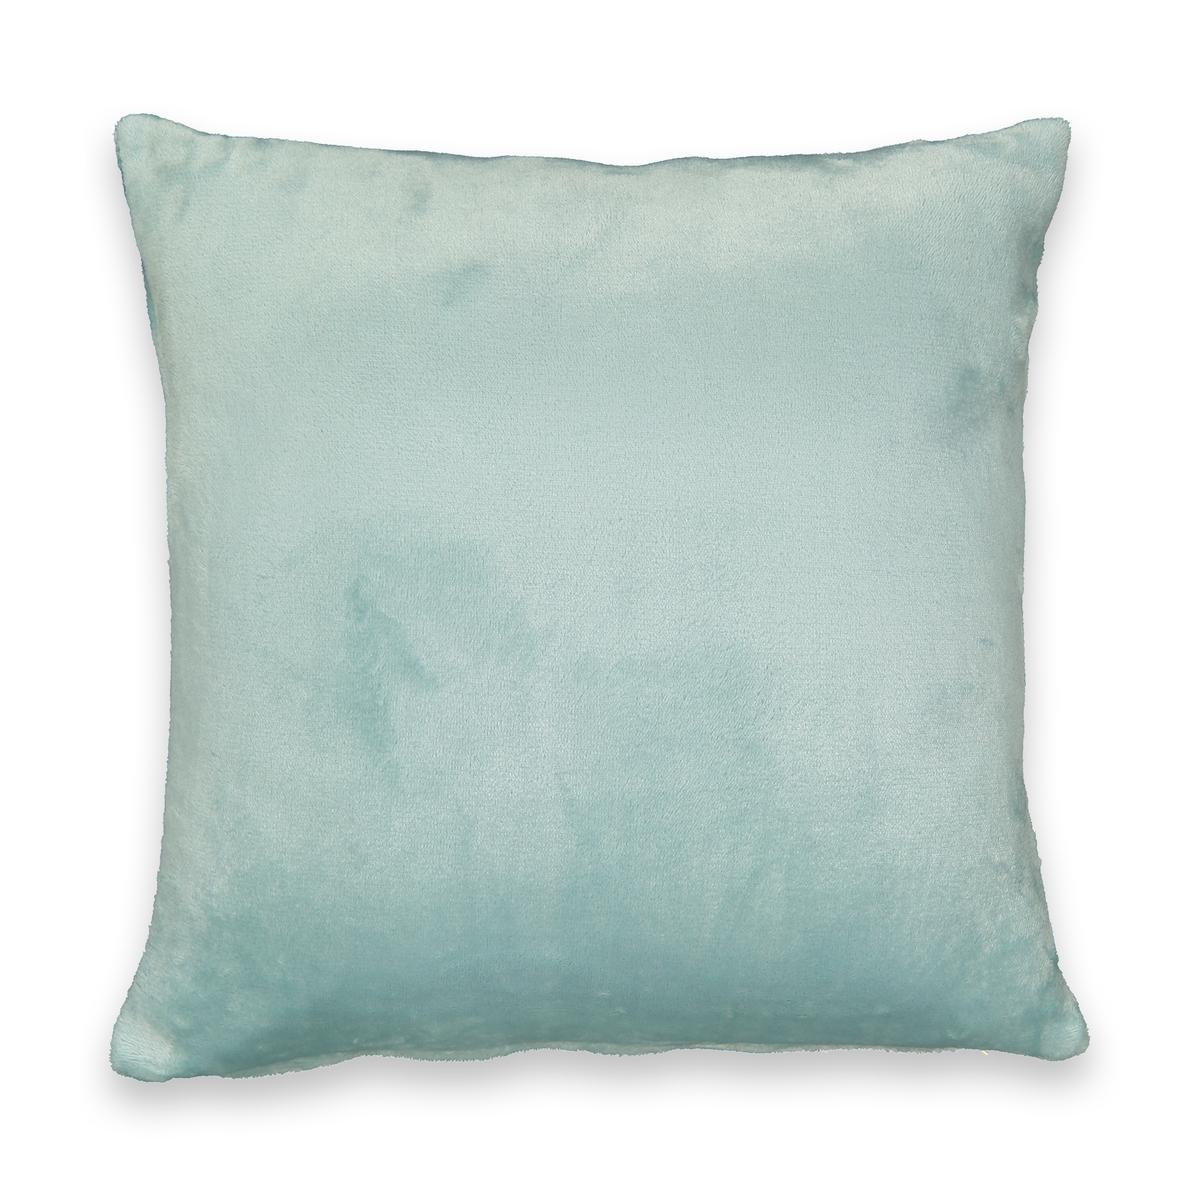 Чехол La Redoute Для подушки MILD 40 x 40 см синий чехол la redoute для подушки eppaloc 45 x 45 см оранжевый